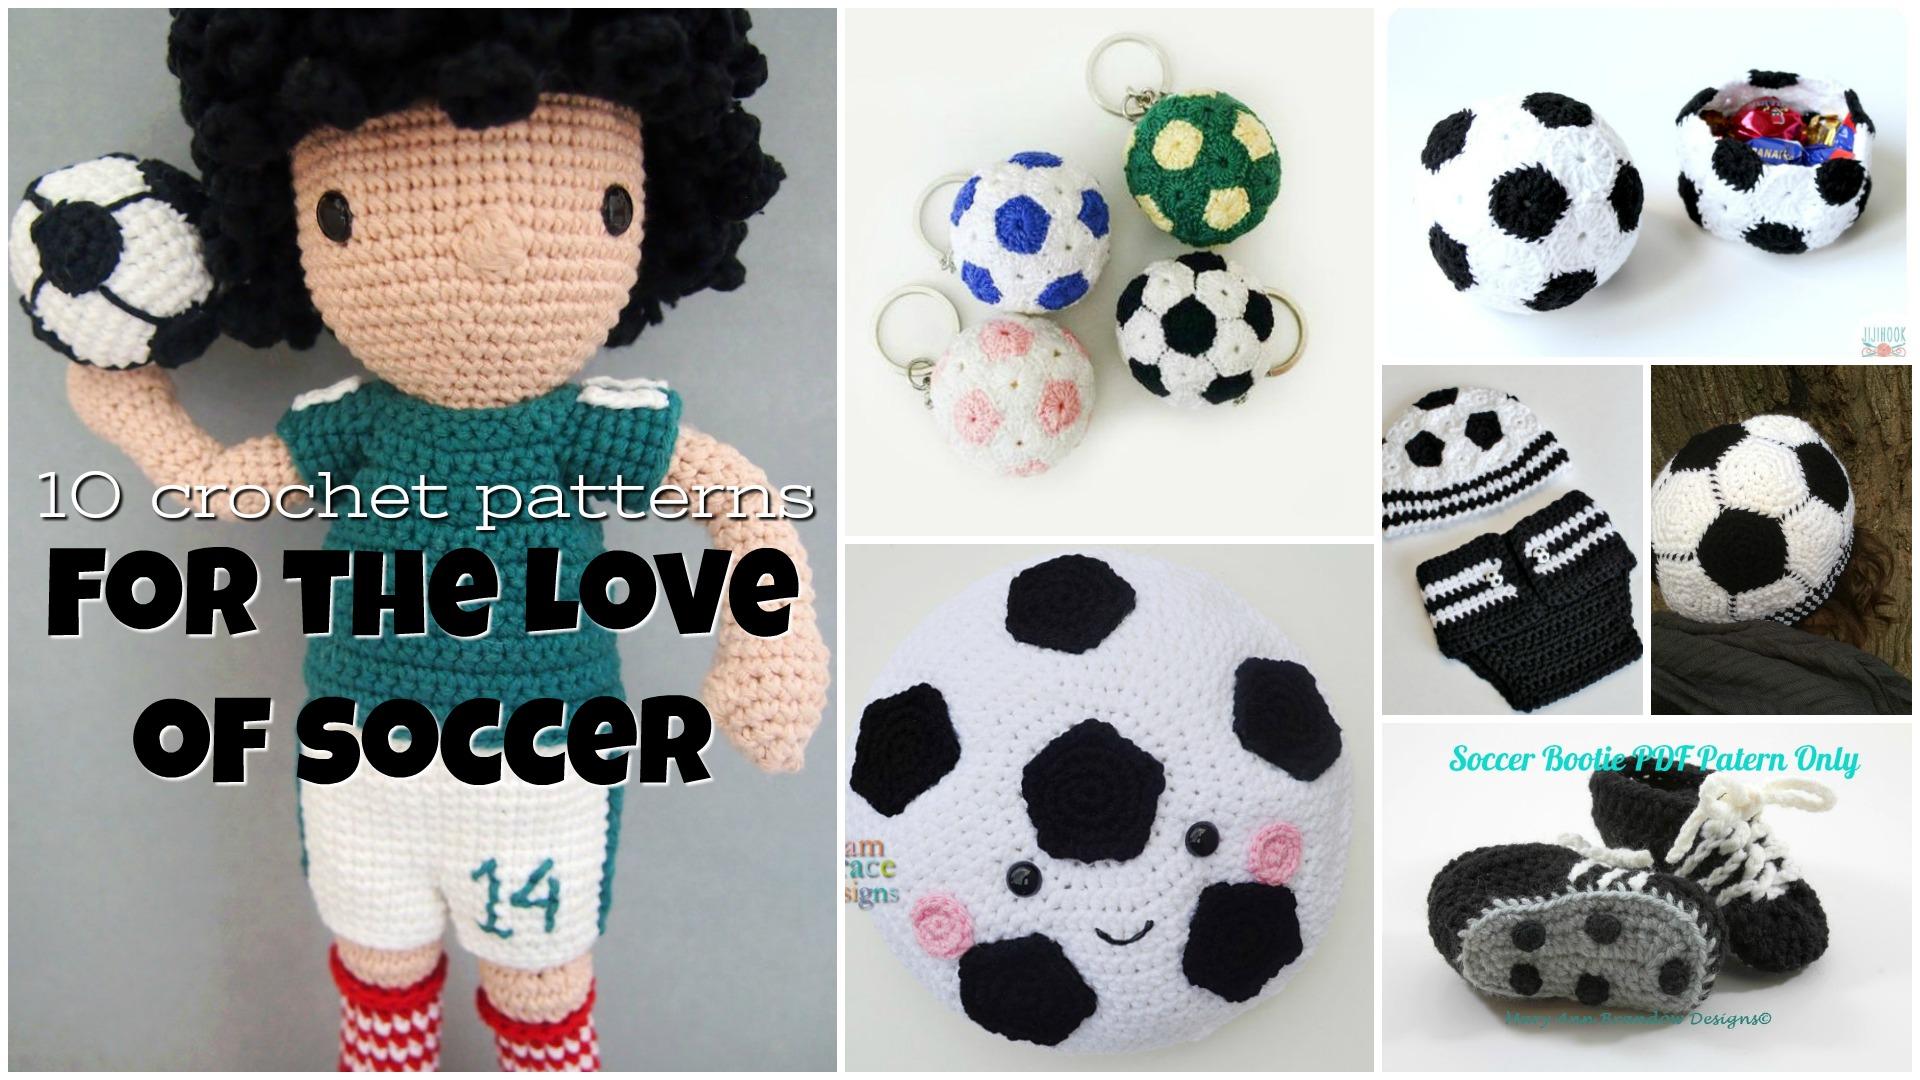 For the Love of Soccer: 10 crochet patterns